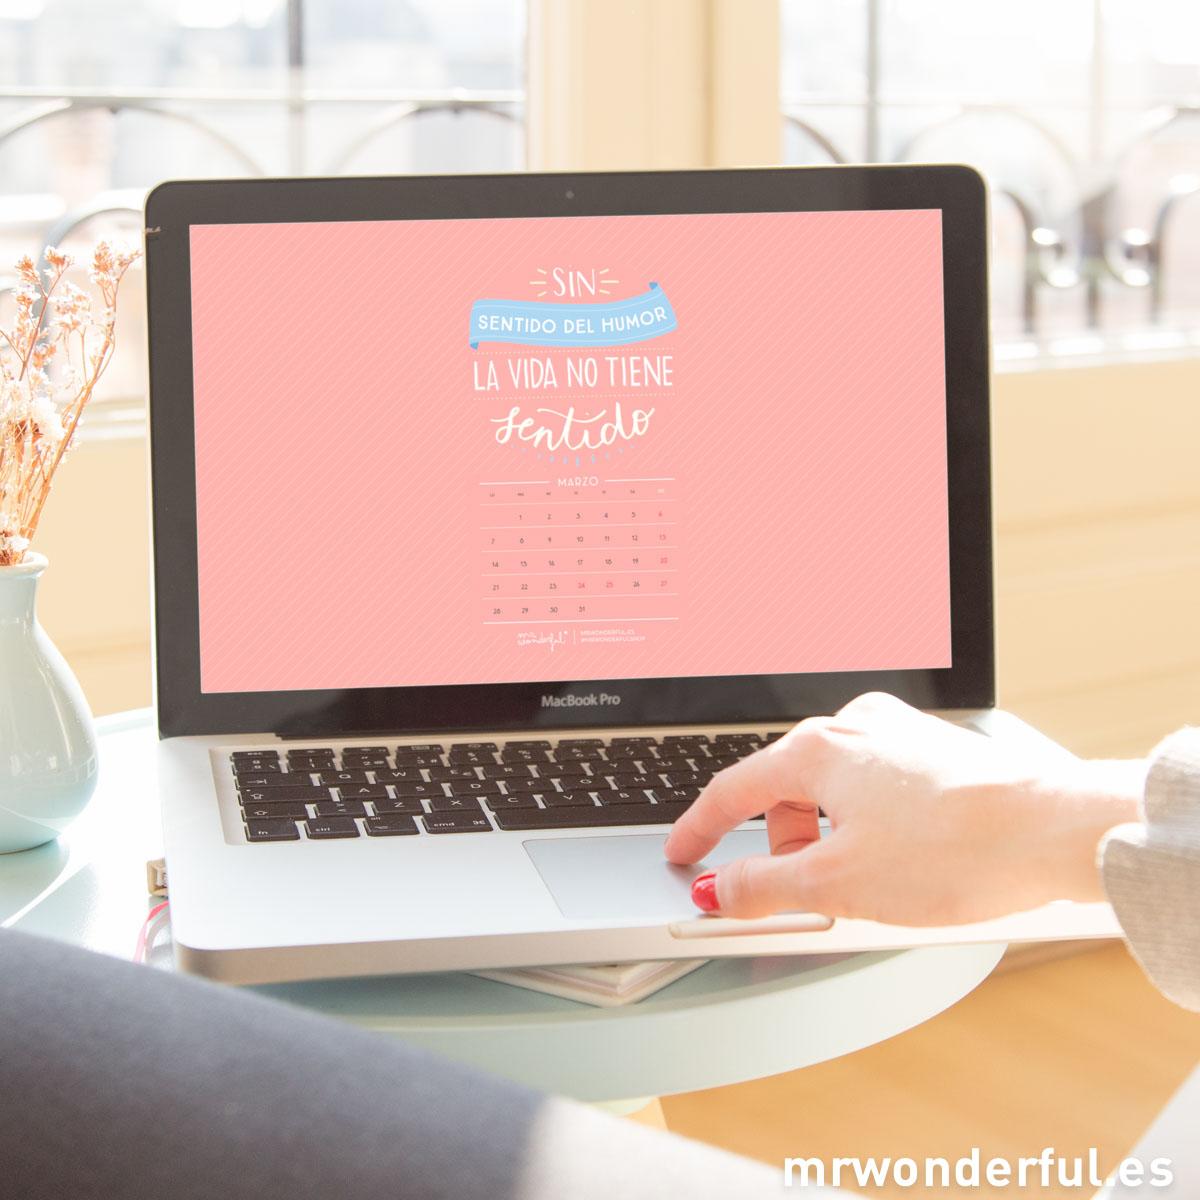 mrwonderful_descargable-fondos-pantallas-6-Editar-Editar-2